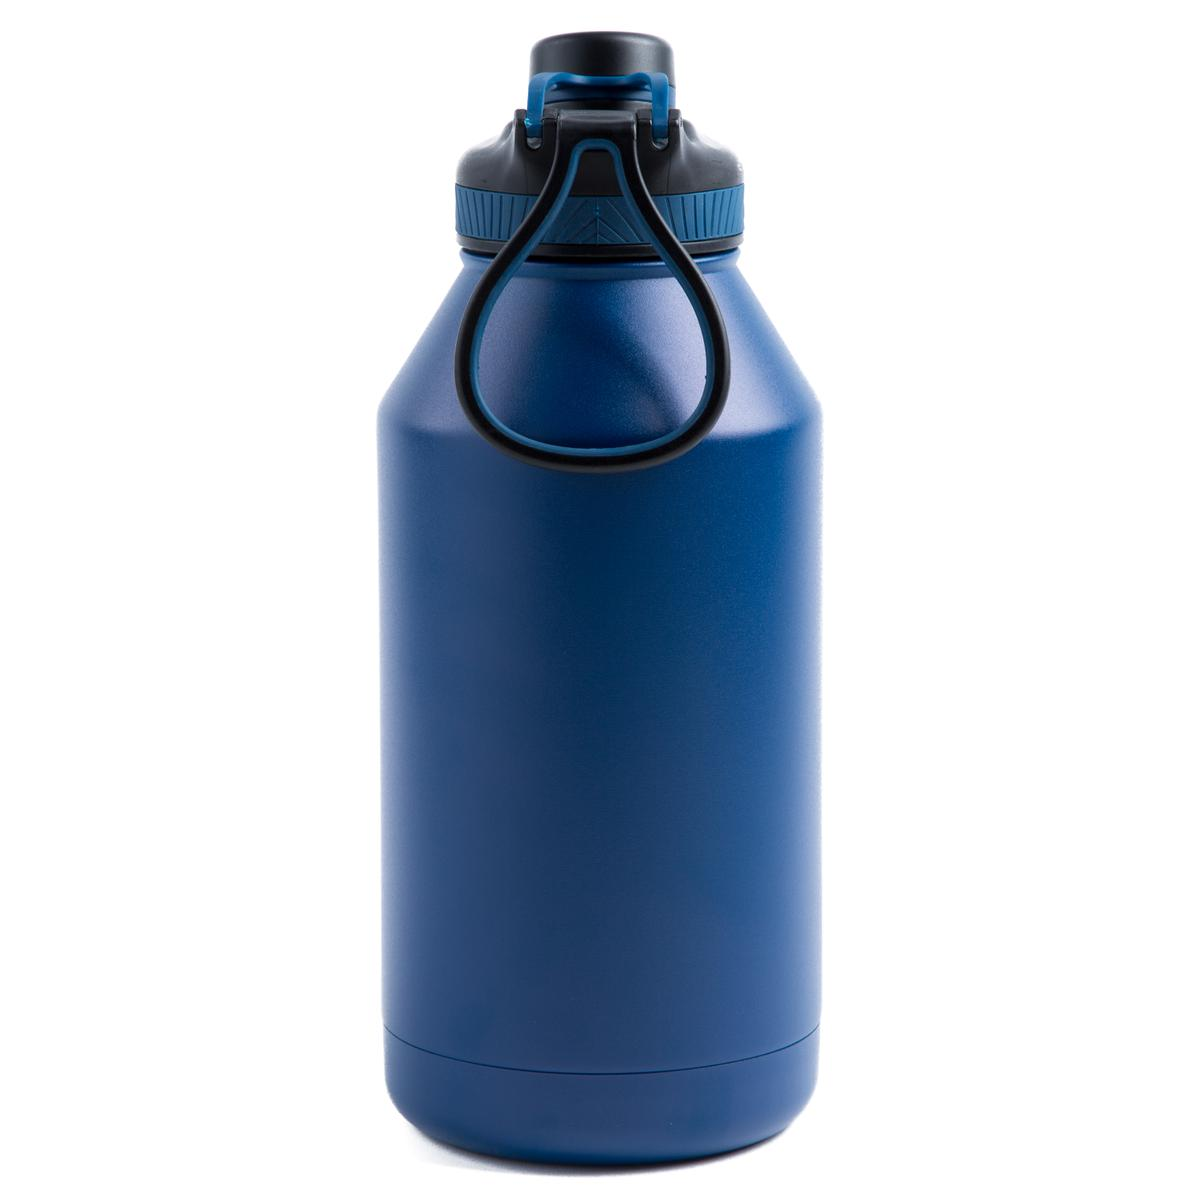 da893d2a5ca TAL Navy 64oz Double Wall Vacuum Insulated Stainless Steel Ranger Pro Water  Bottle - Walmart.com